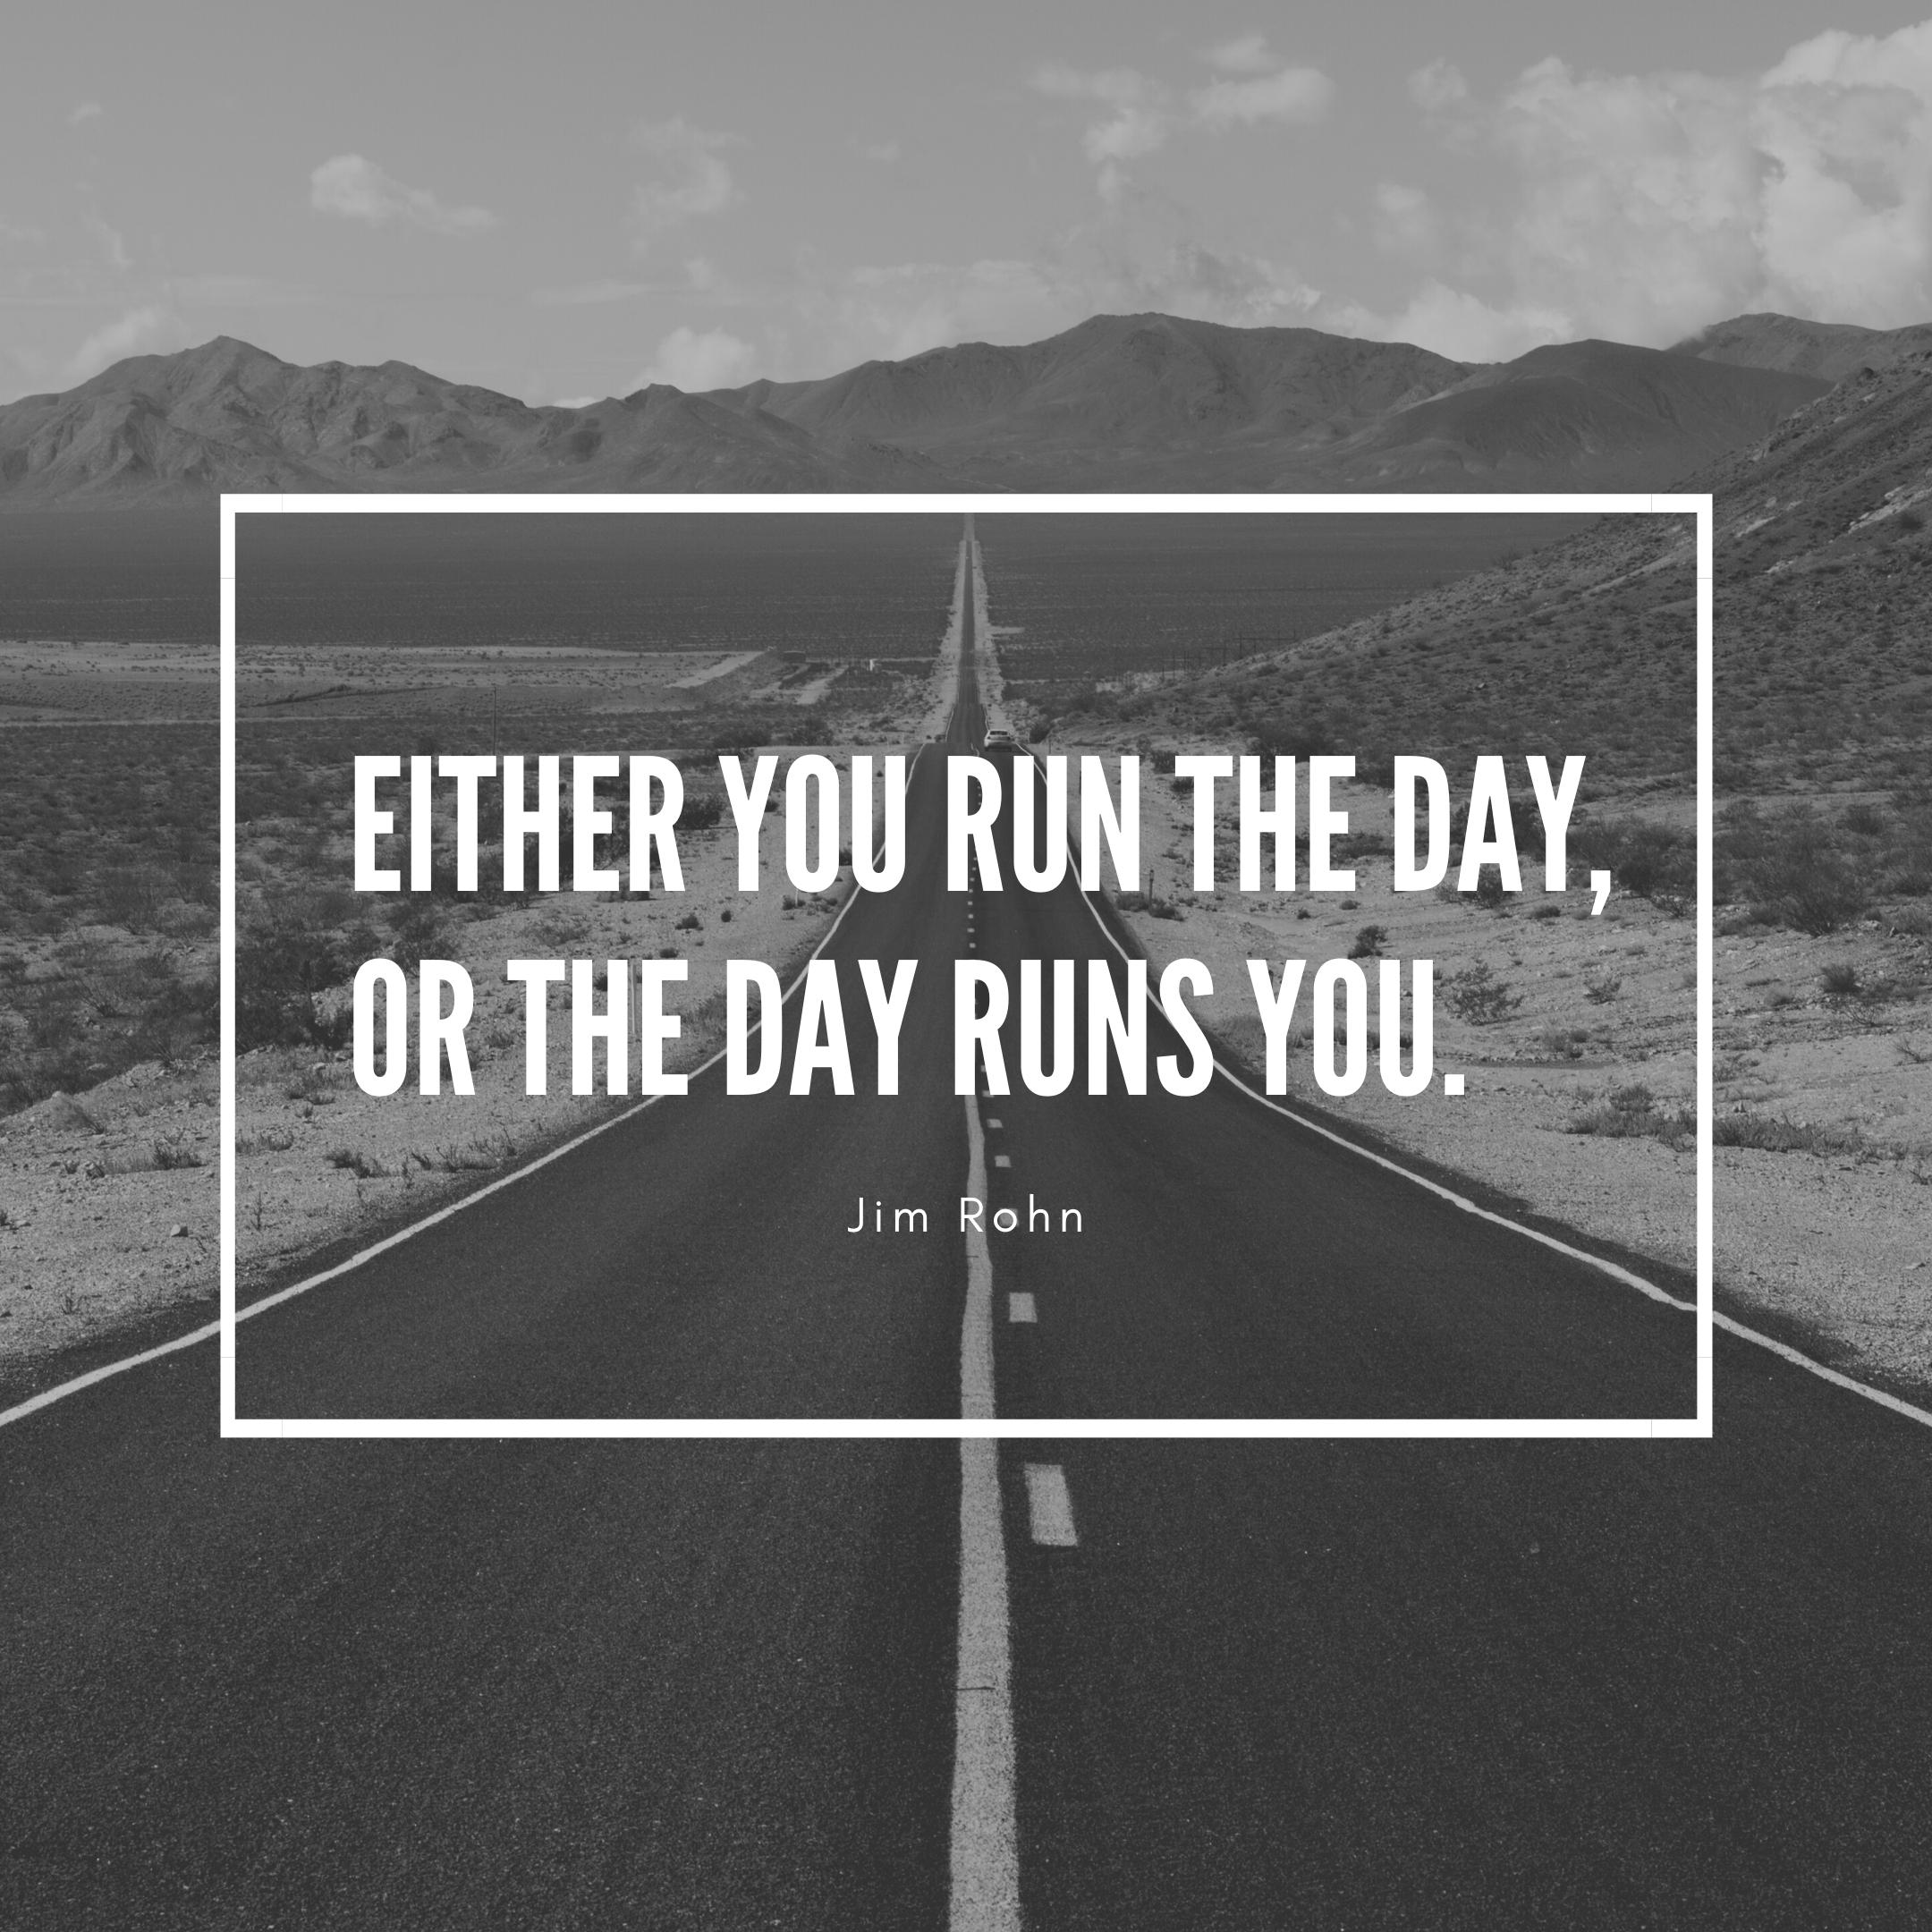 jim rohn quote   daily motivation